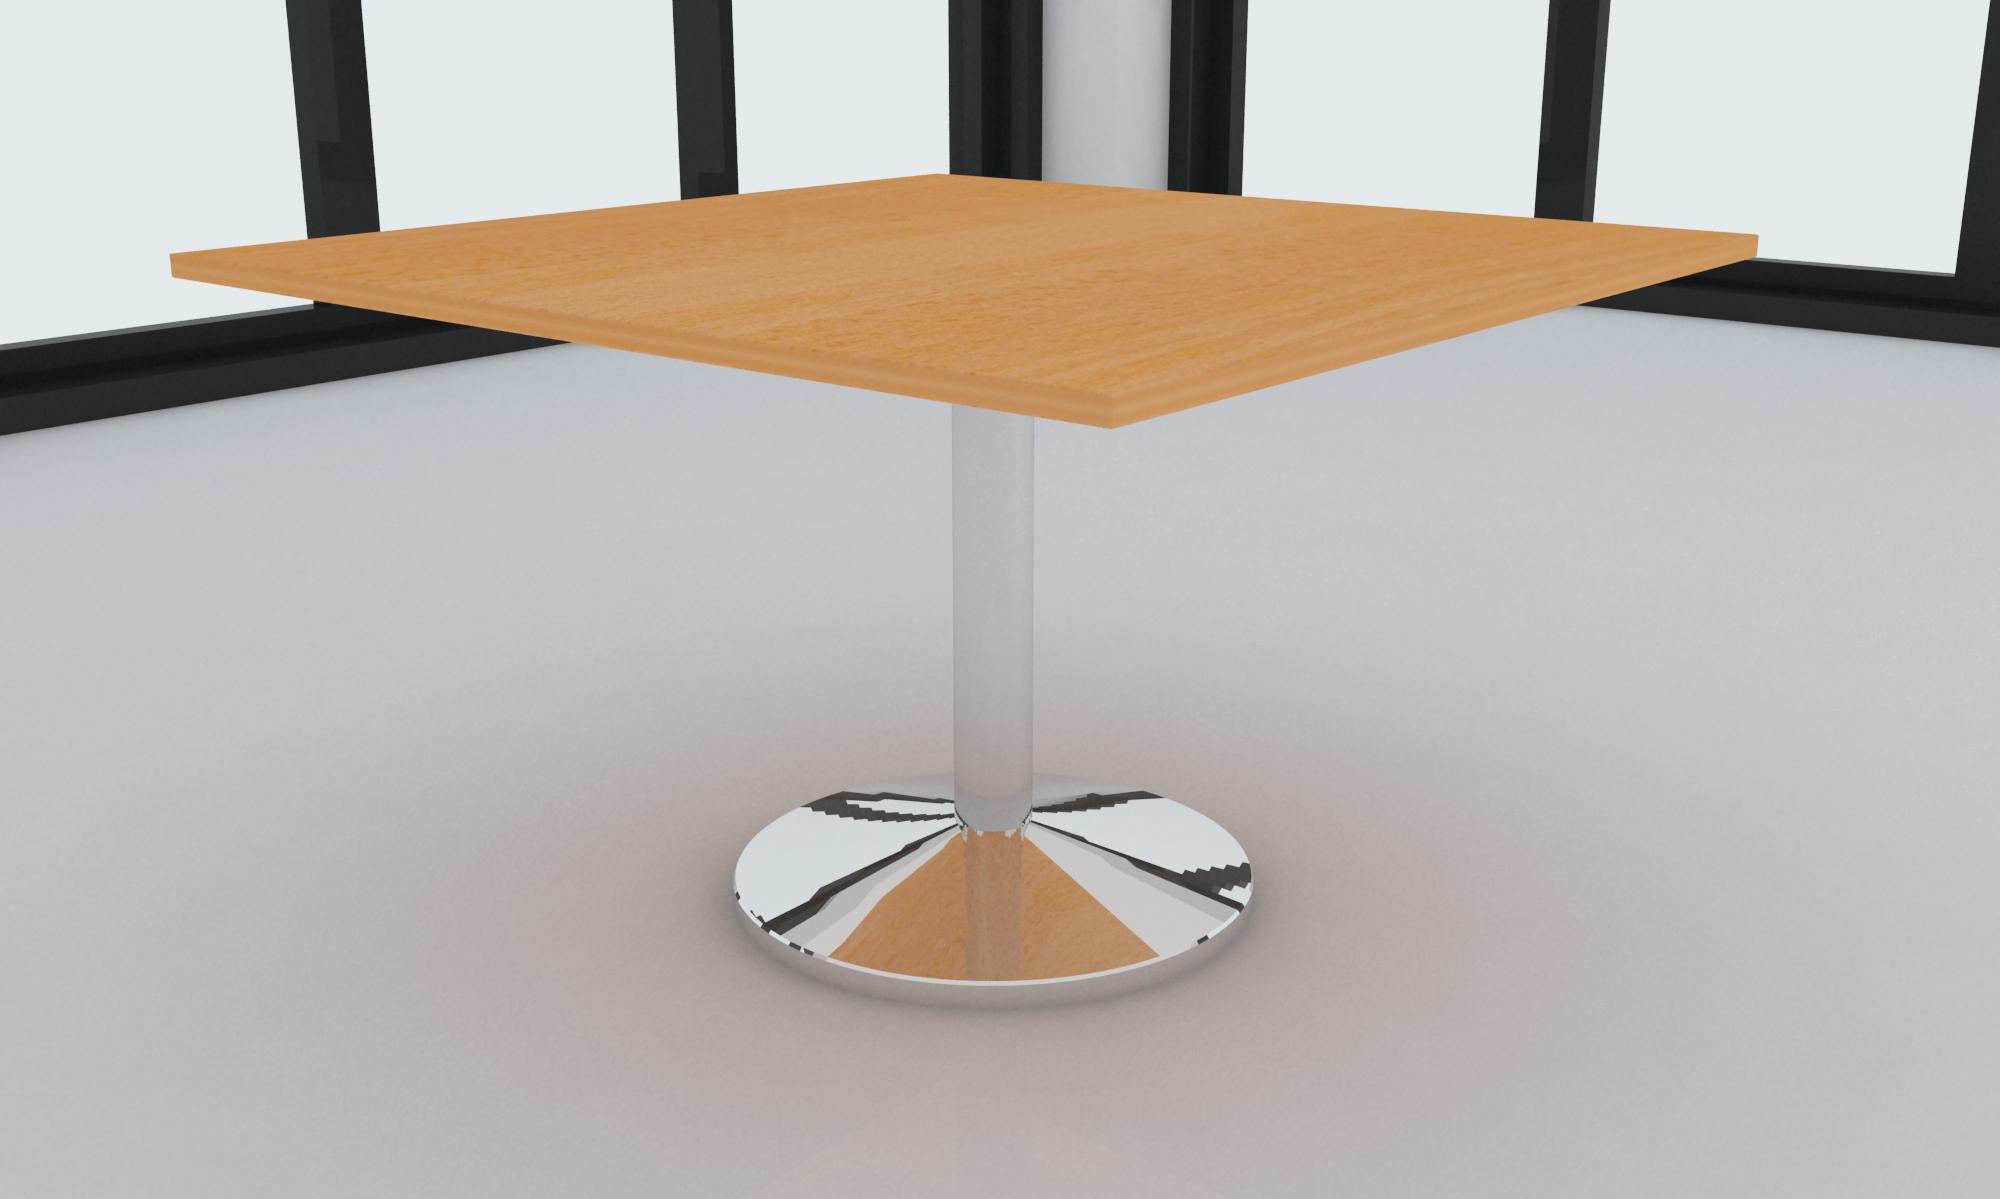 LINZ InternationalMeeting Tables - Square meeting table